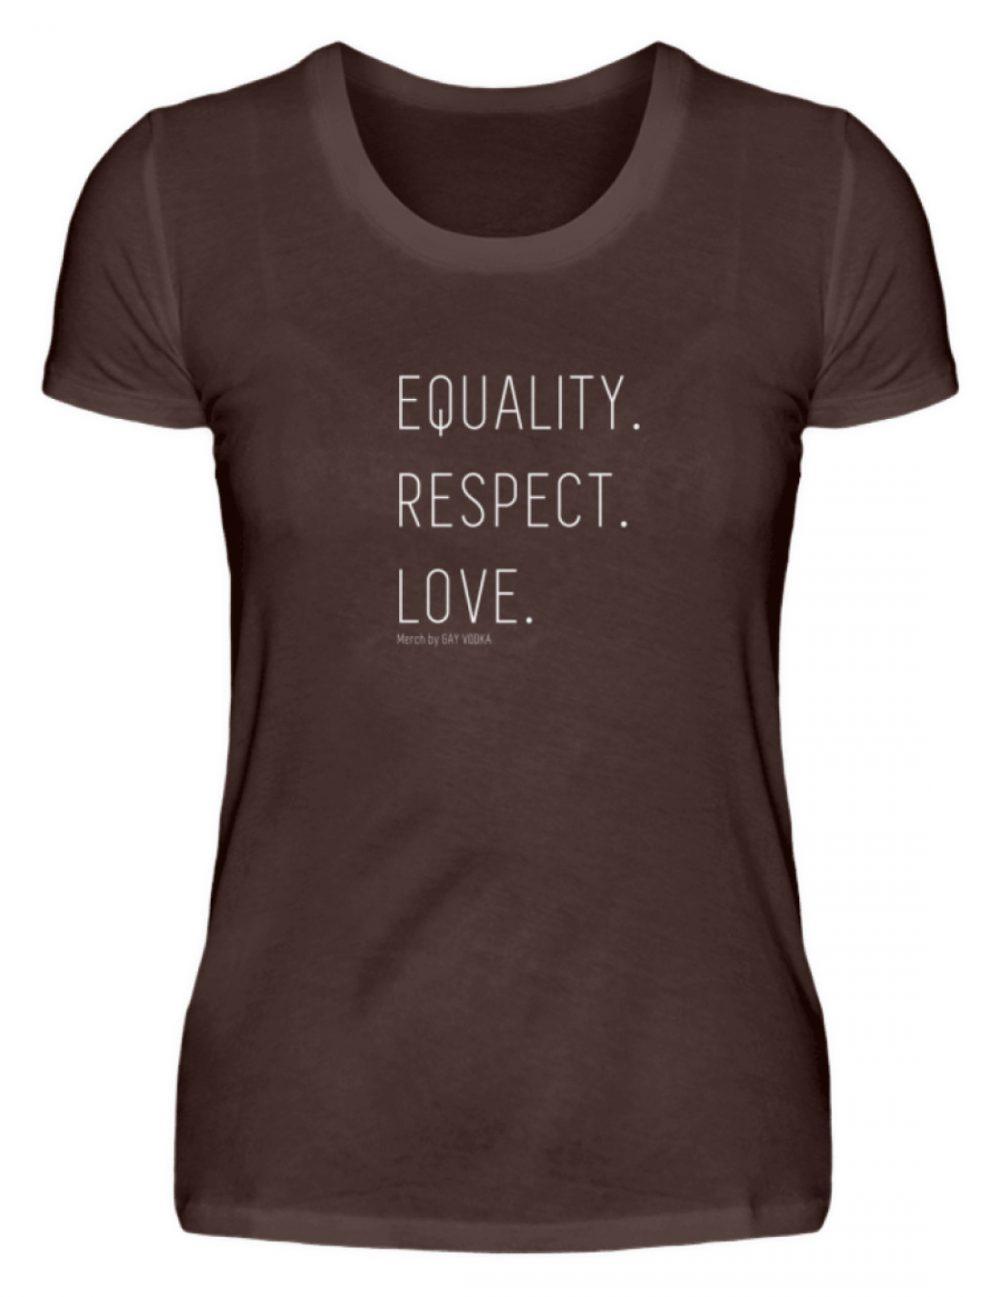 EQUALITY. RESPECT. LOVE. - Damen Premiumshirt-1074